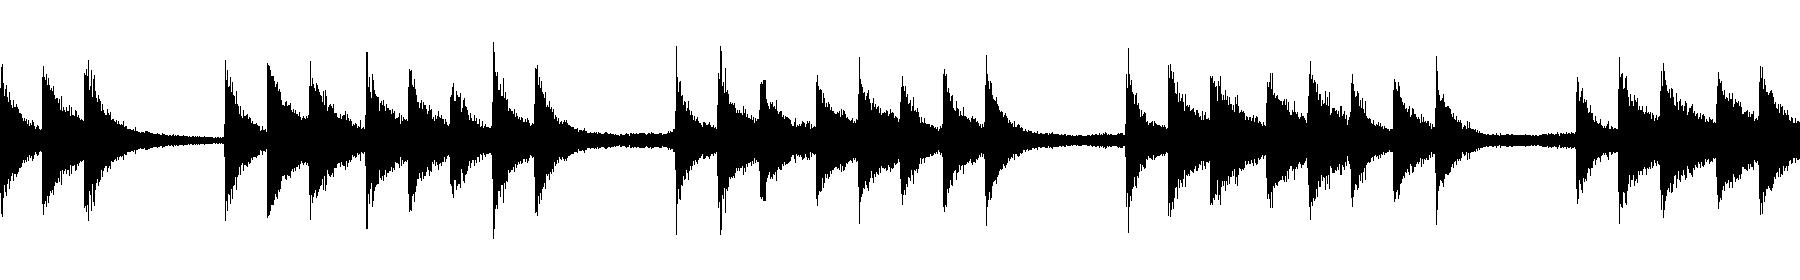 dts chordlp 06 gm wet